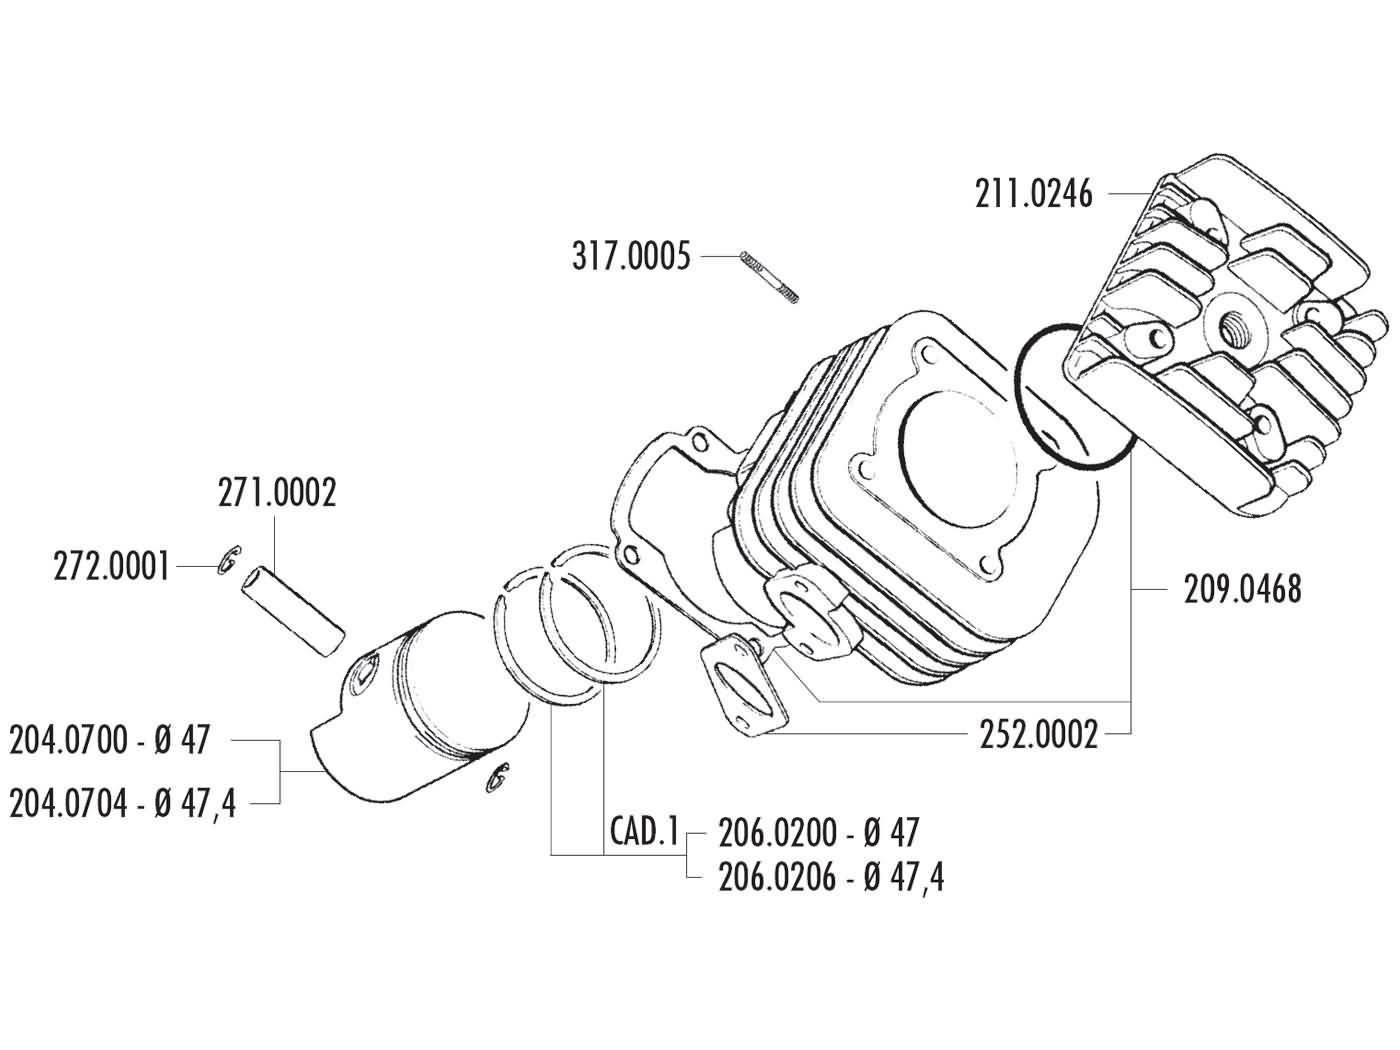 Zylinderkopf Polini Sport 70ccm 47mm Fr Minarelli Liegend Ac Cpi Roketa Maui 50 Wiring Diagram Keeway Kymco Sf10